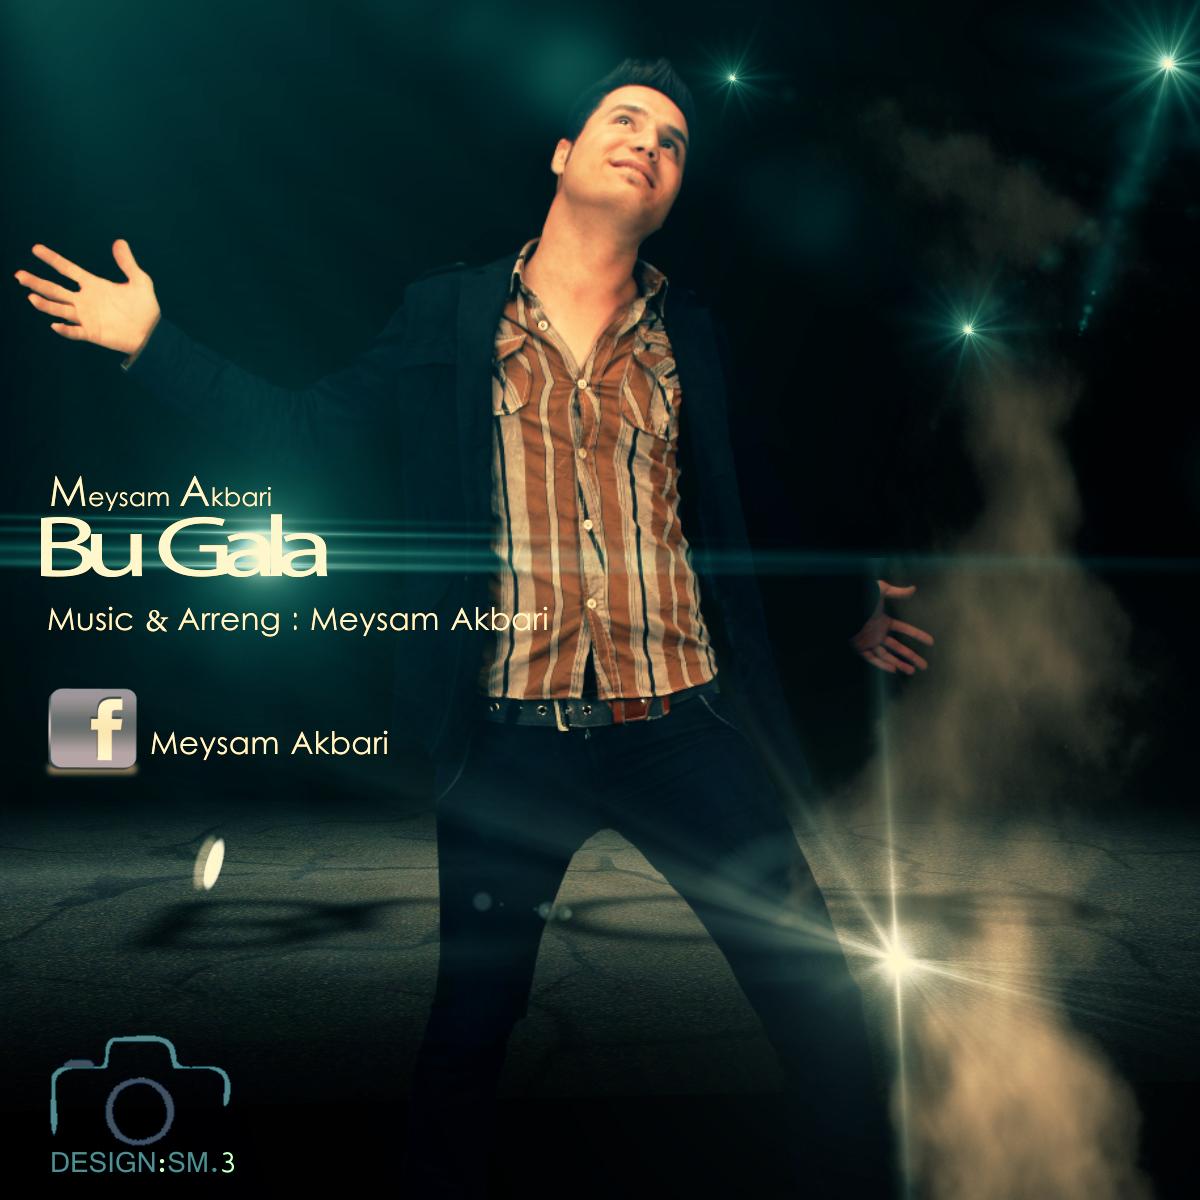 http://s8.picofile.com/file/8295955518/38Meysam_Akbari_Bu_Gala.jpg